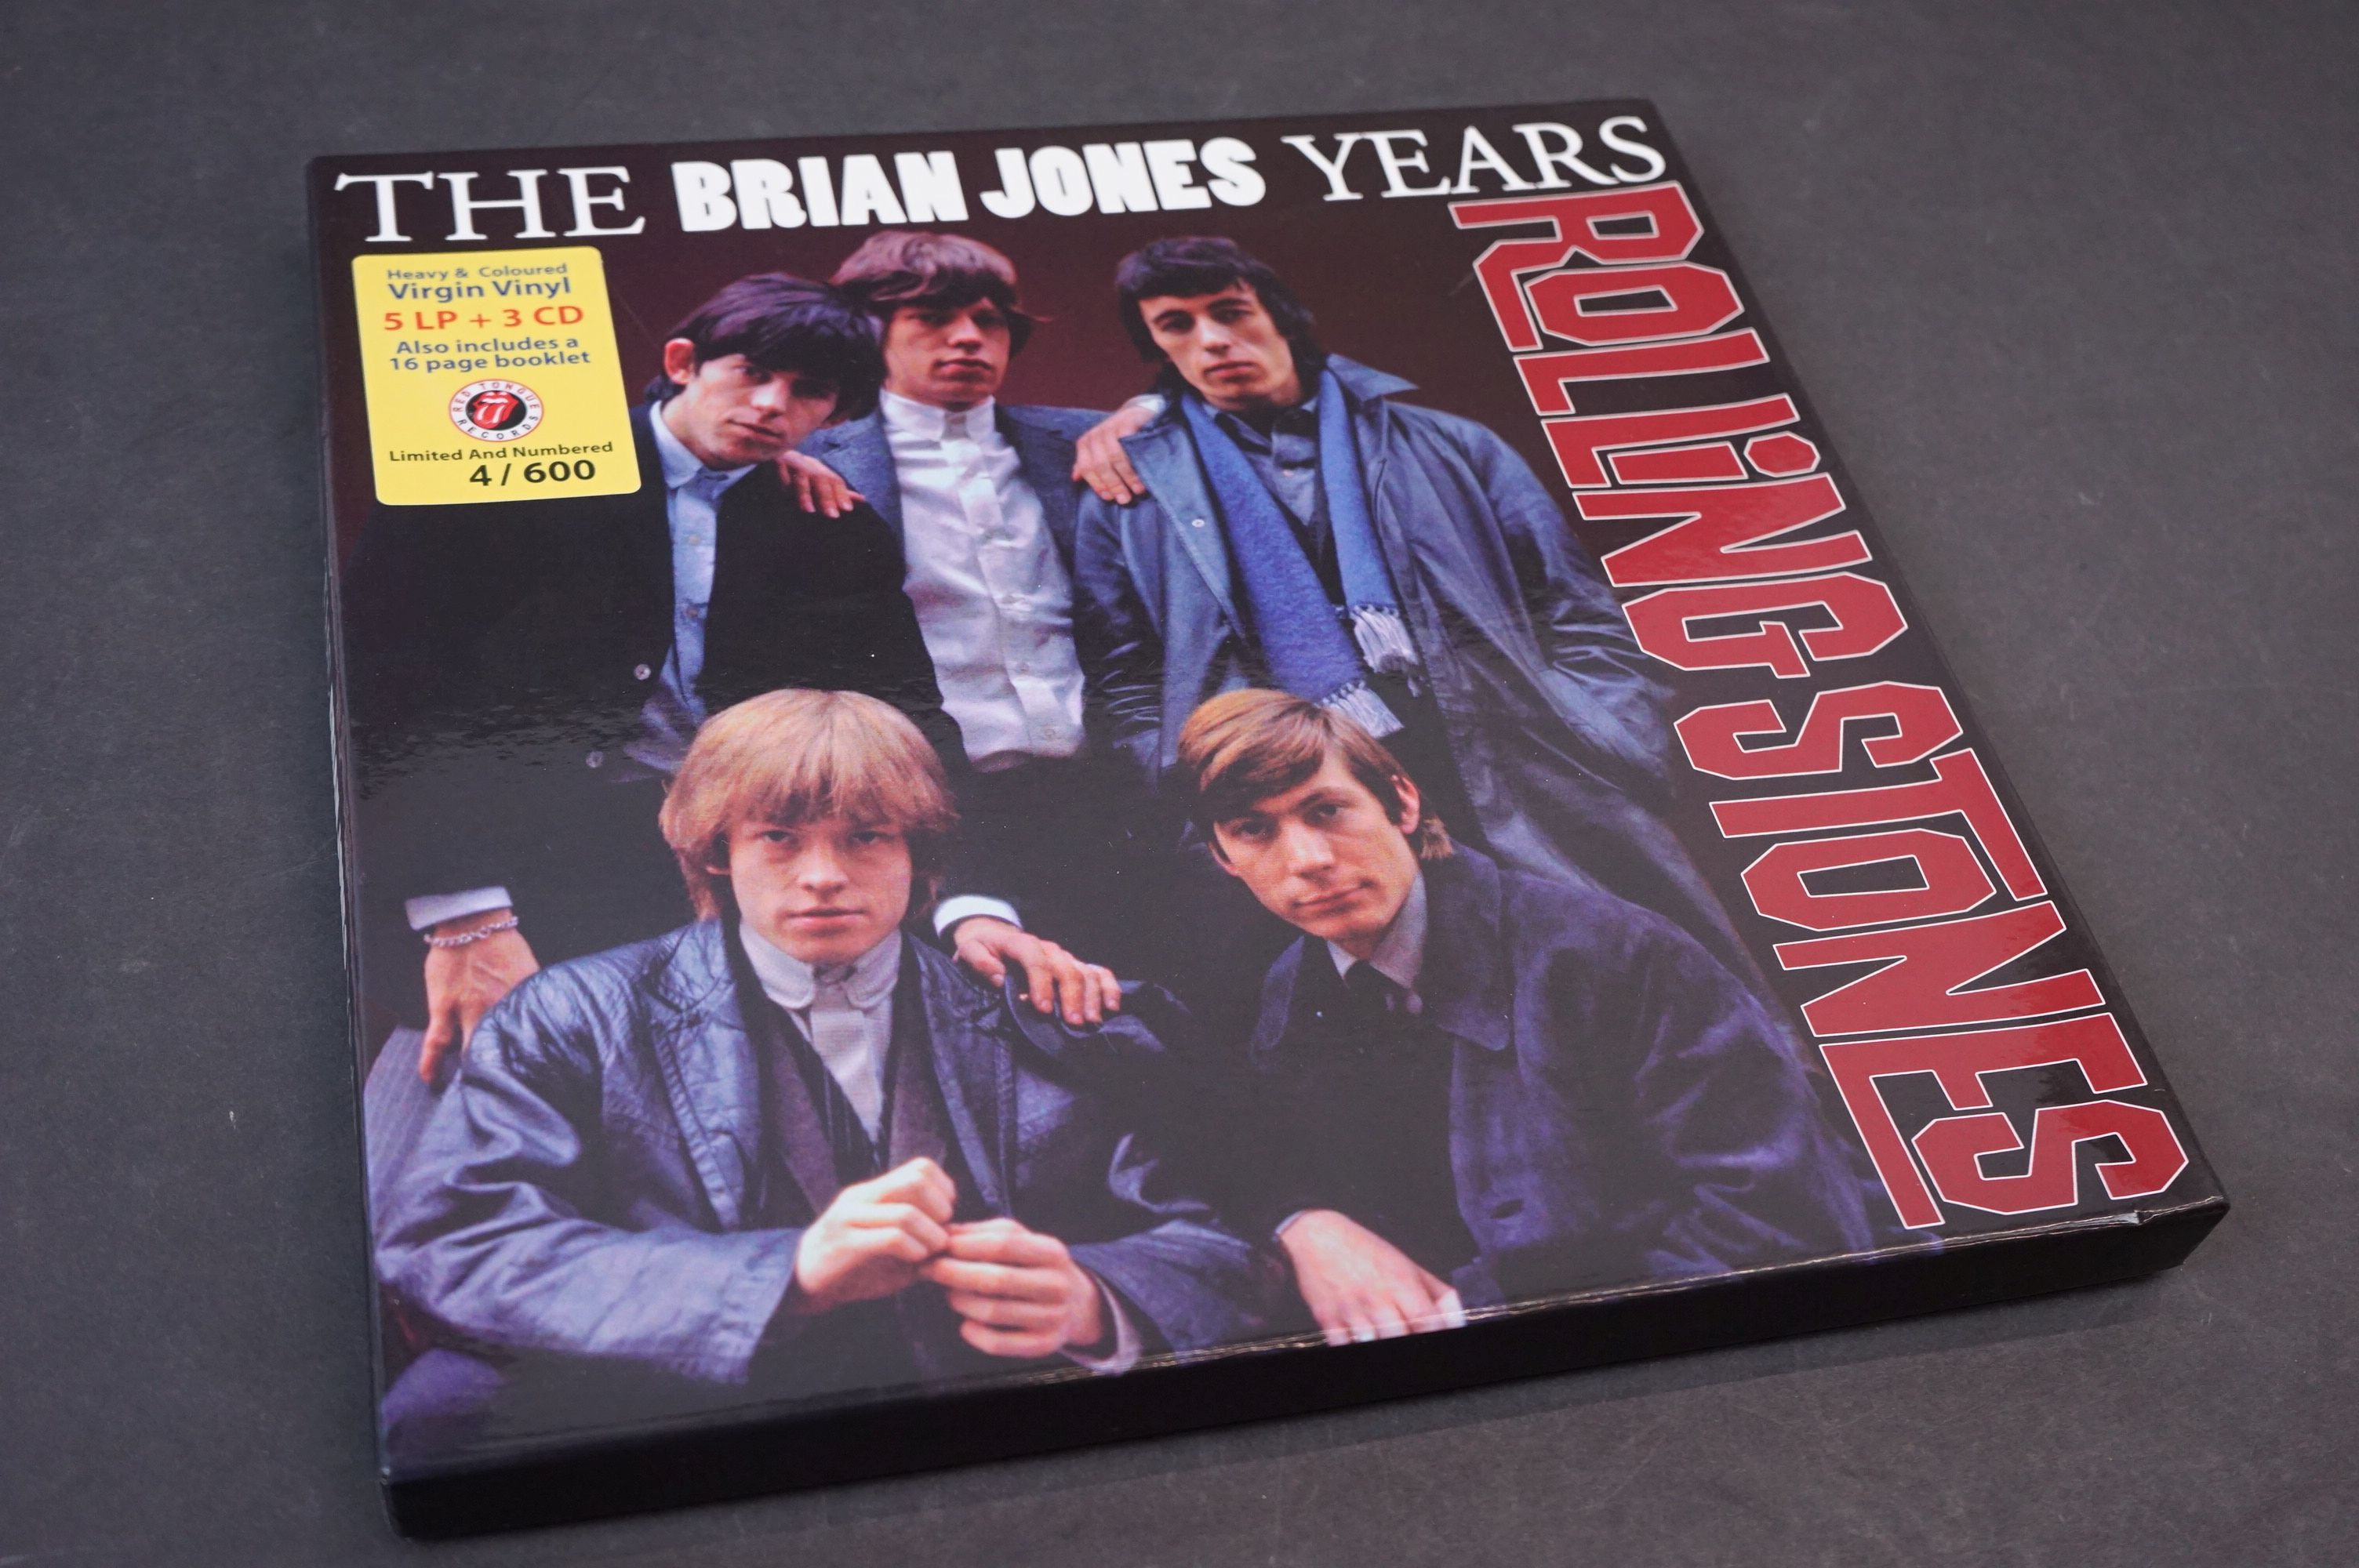 Vinyl - ltd edn The Rolling Stones The Brian Jones Years 5 LP / 3 CD Box Set RTR019, heavy - Image 11 of 12